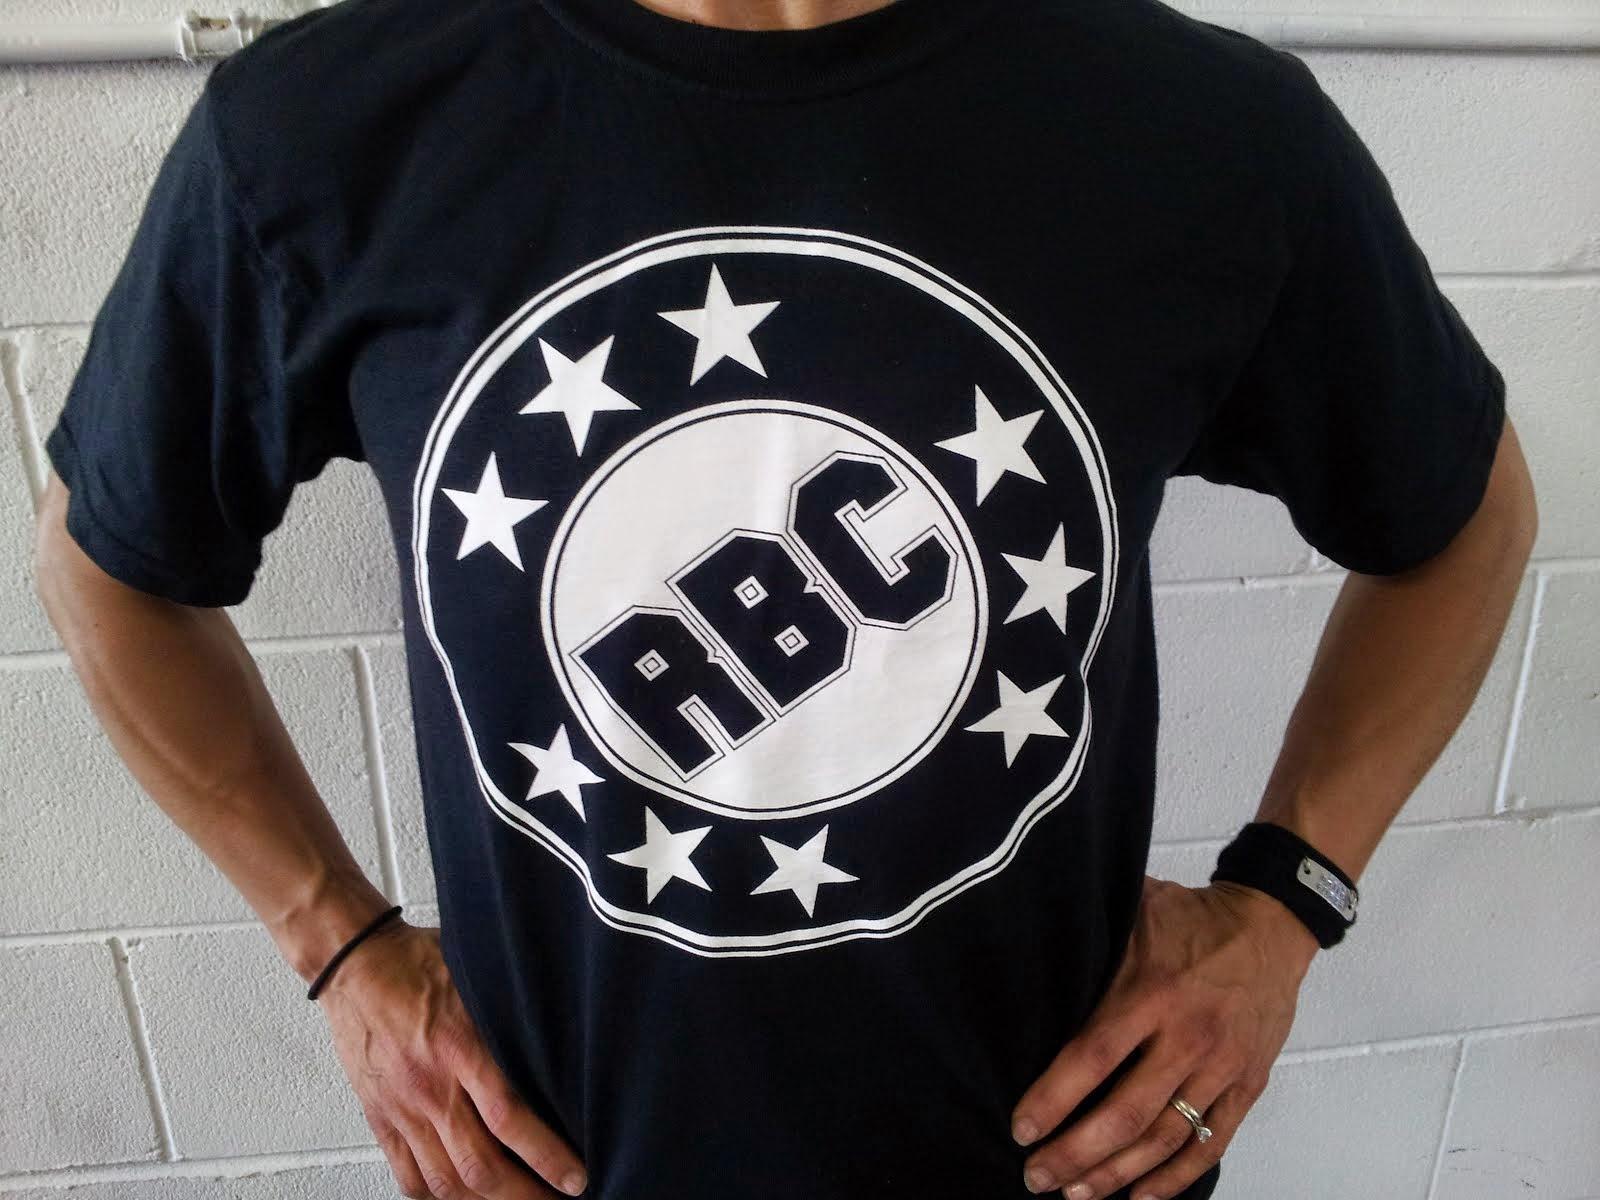 RBC shirts